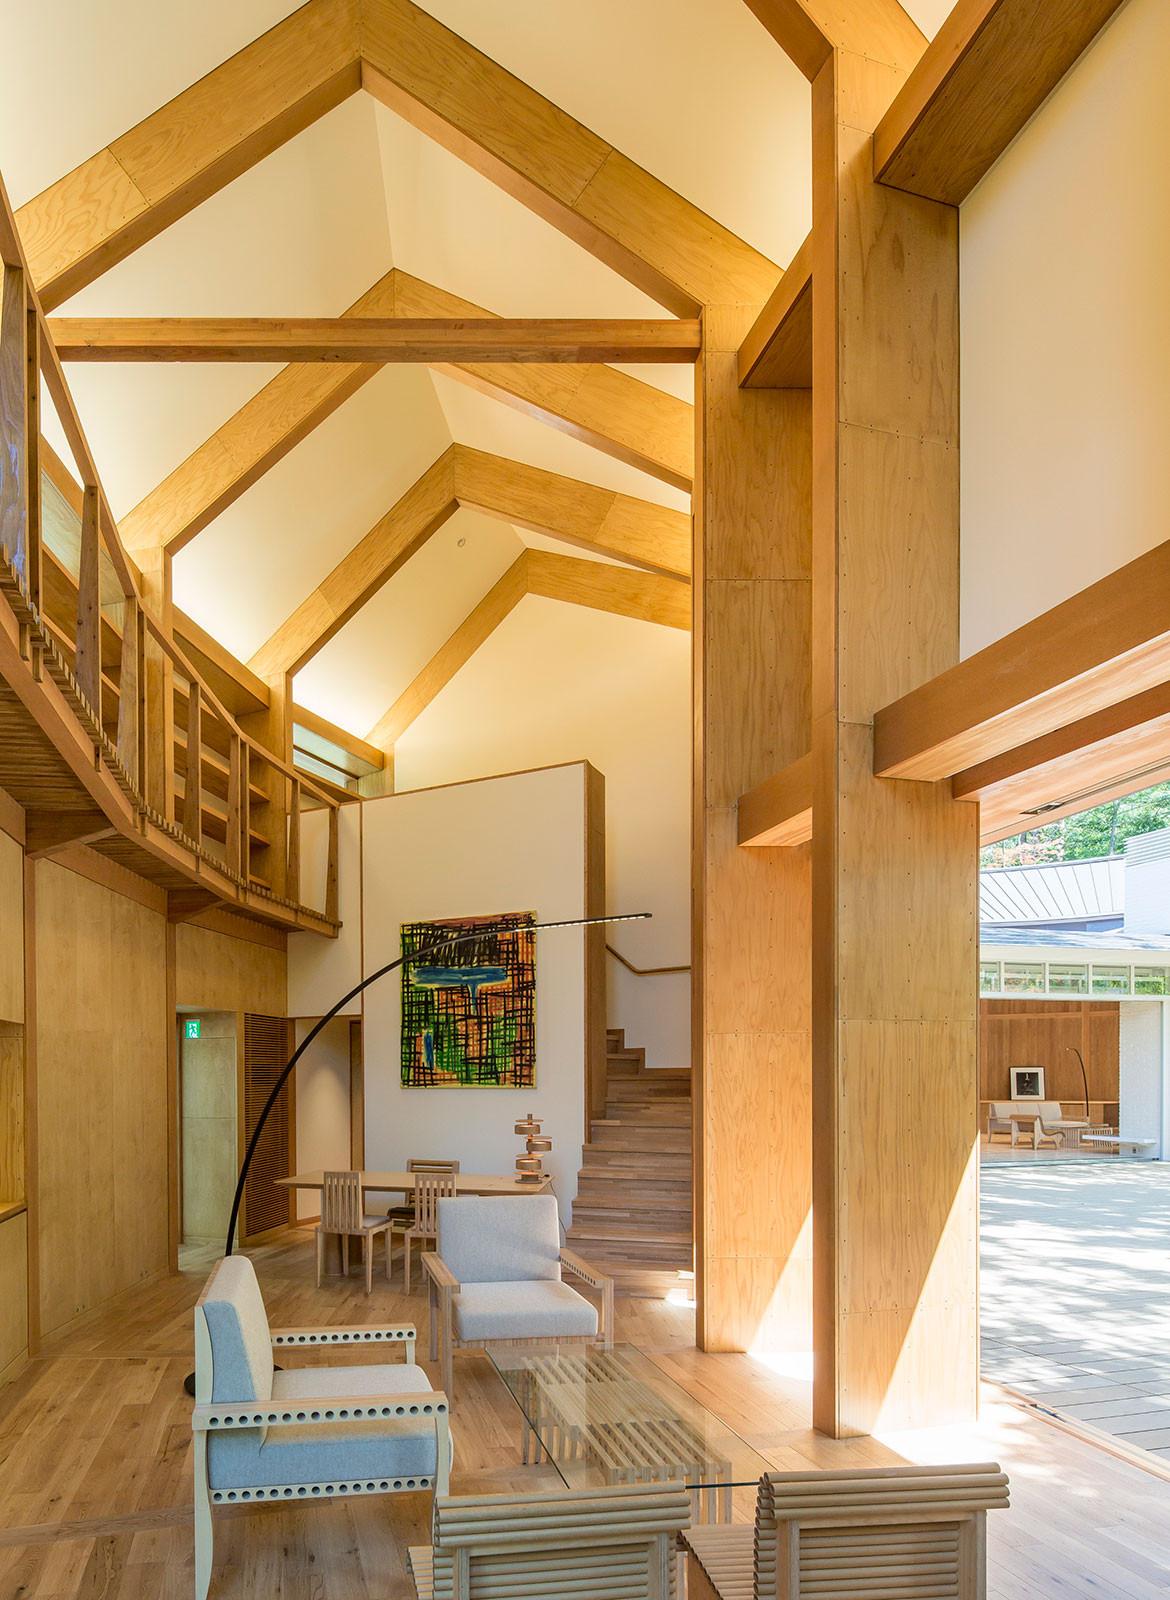 Shishi-Iwa House Shigeru Ban Japan library